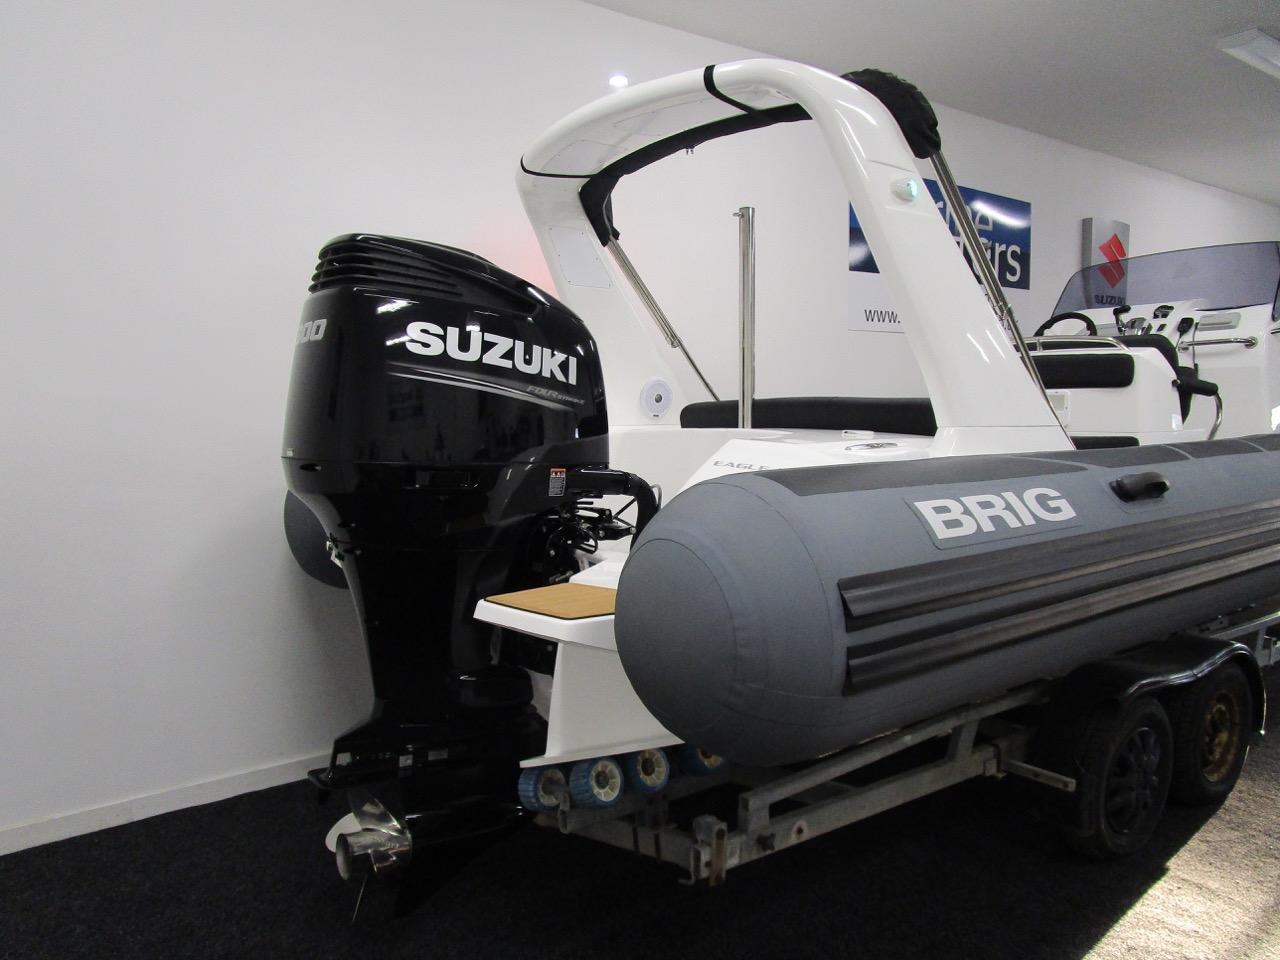 Suzuki DF300APX four stroke outboard